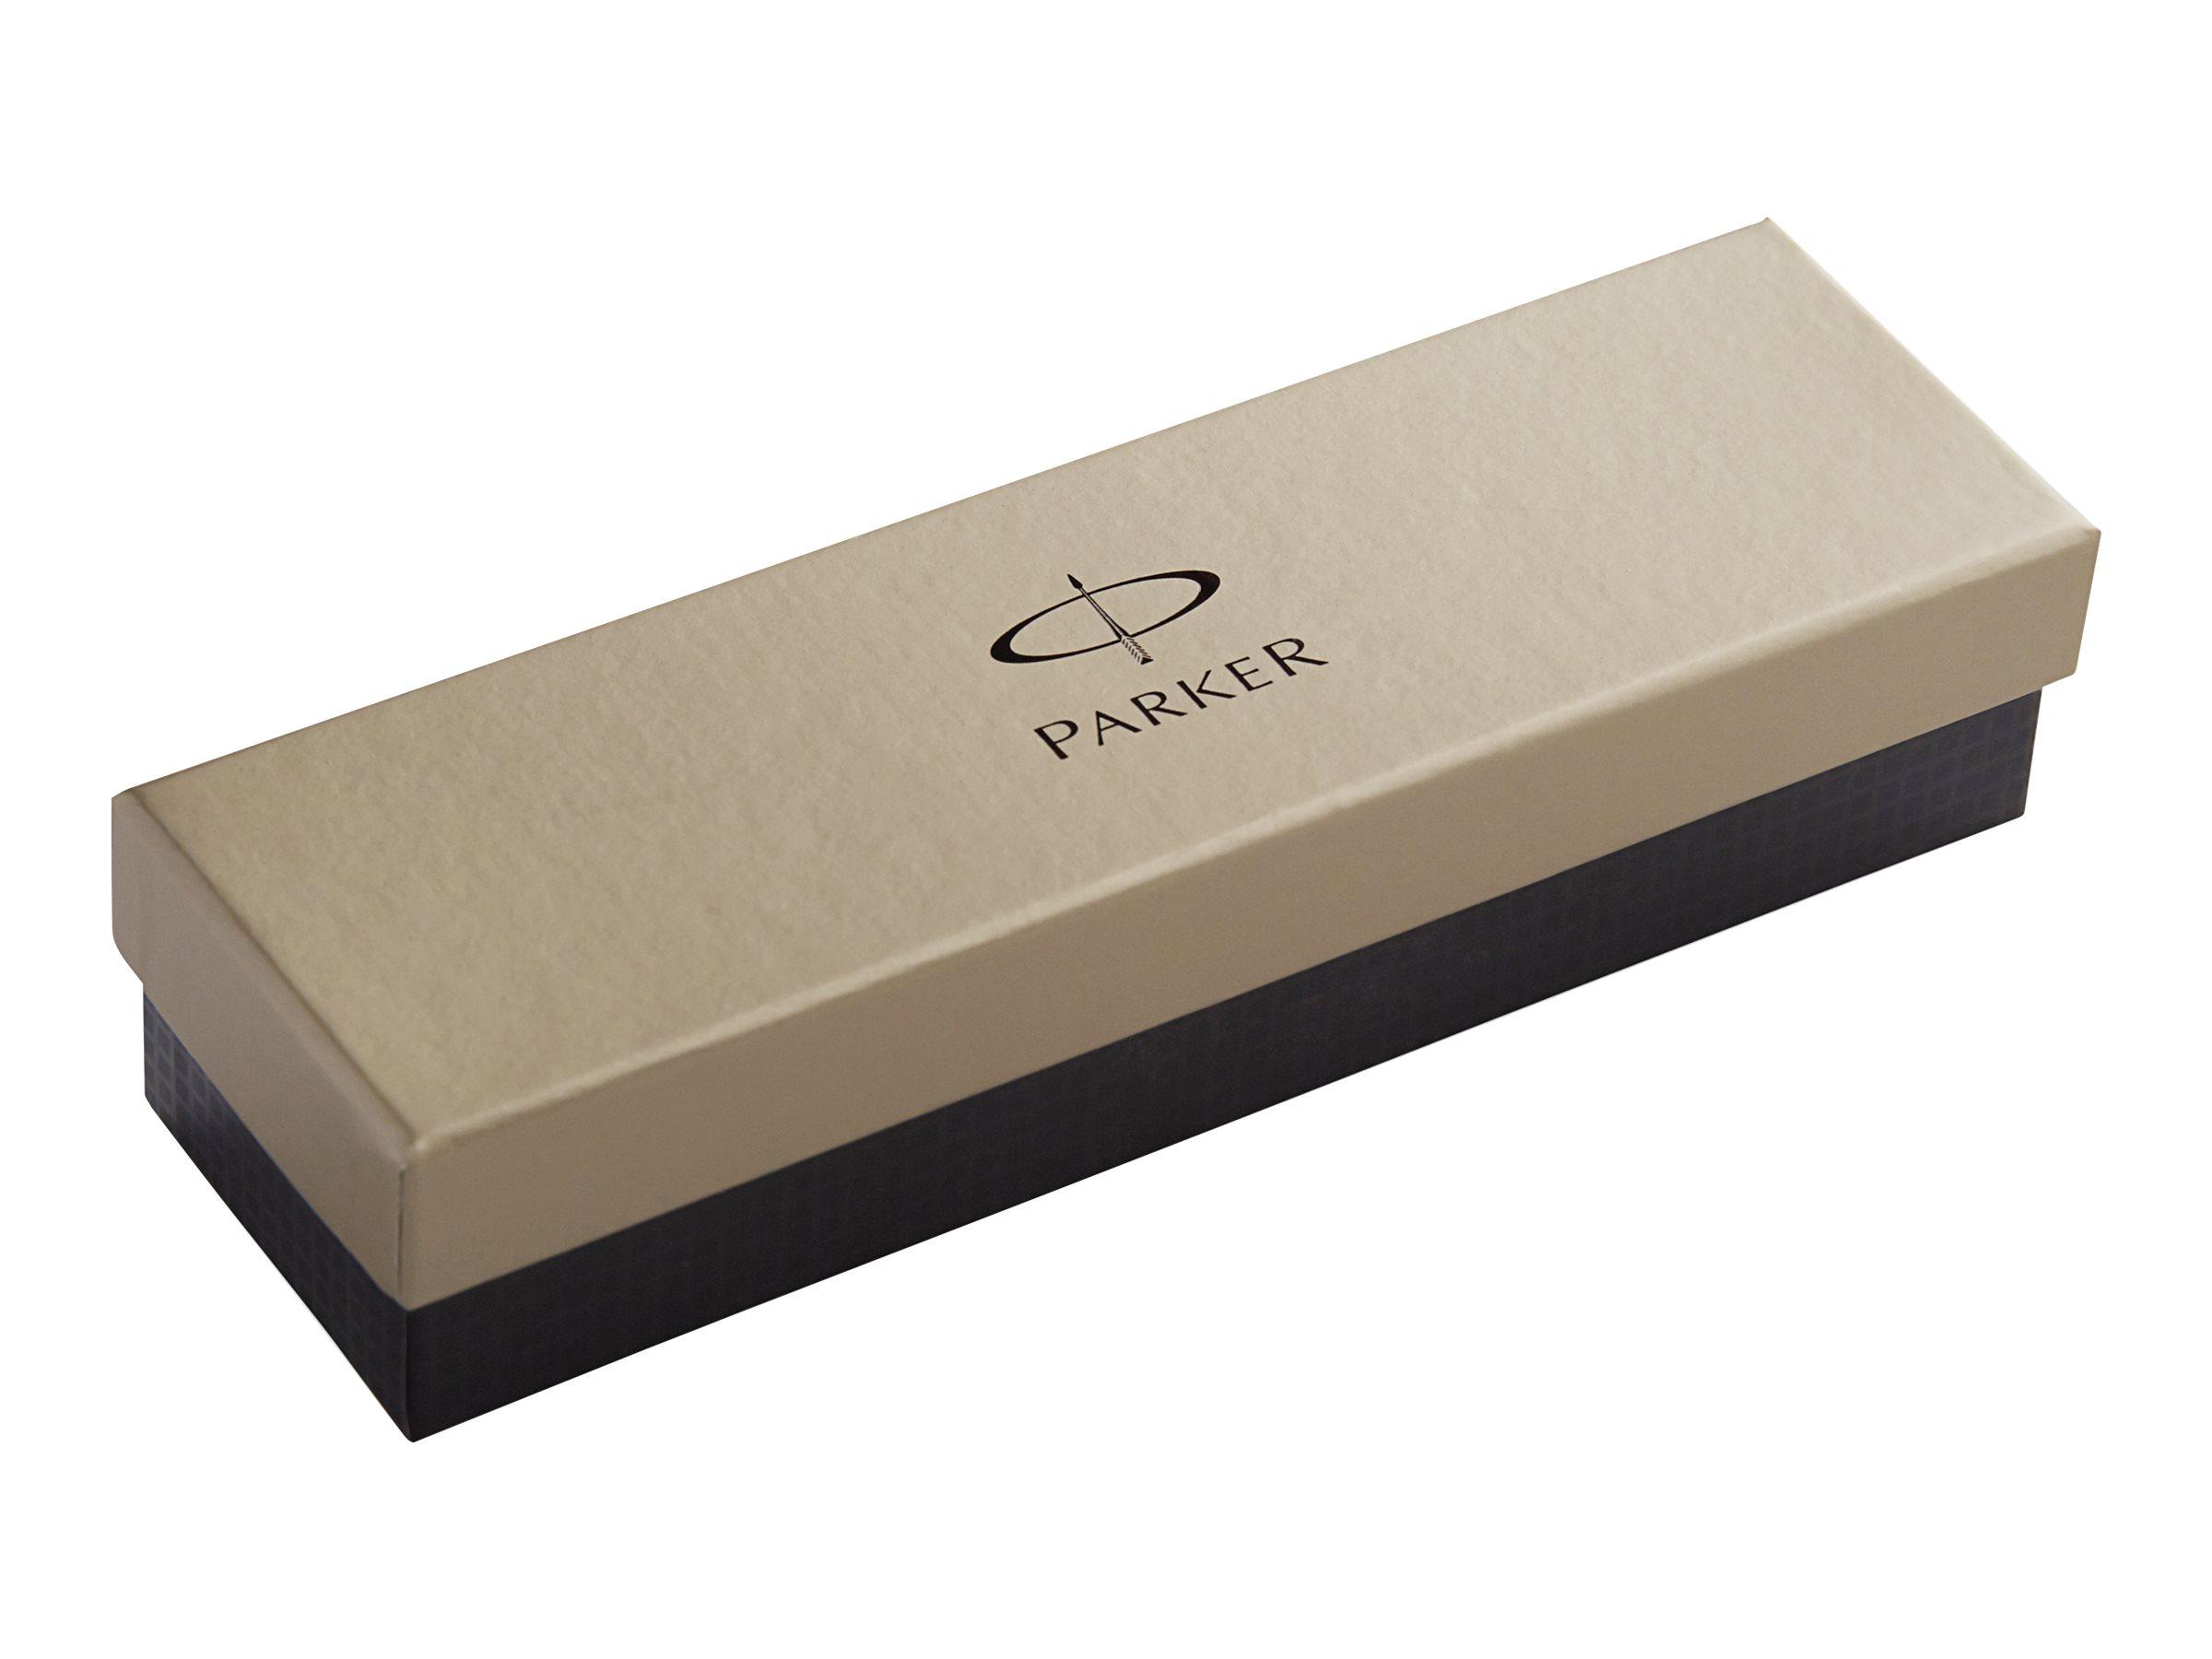 parker urban premium stylo plume moyen diff rents. Black Bedroom Furniture Sets. Home Design Ideas